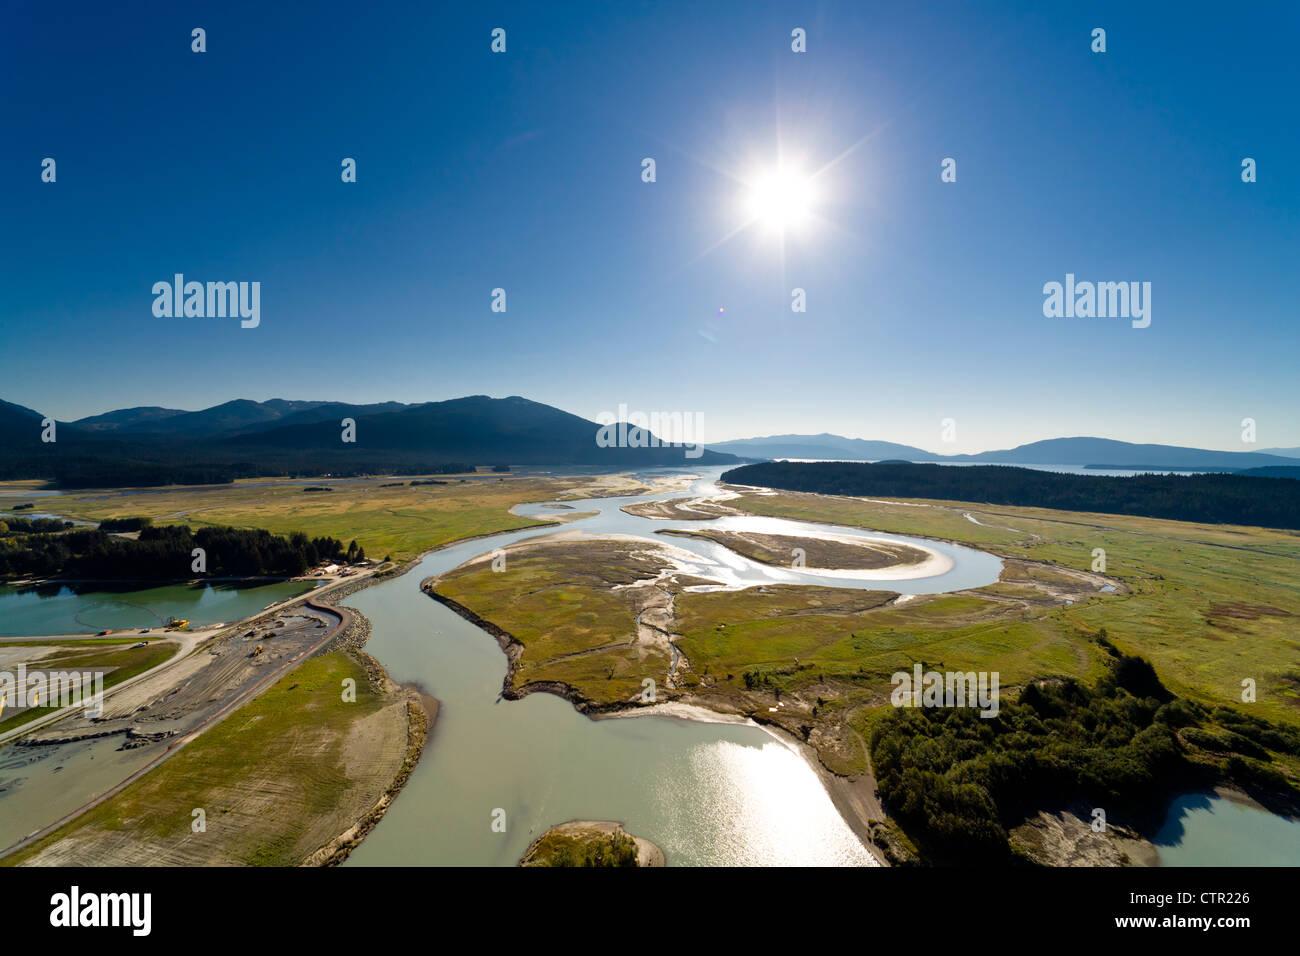 Aerial view of the Mendenhall Wetlands State Game Refuge towards Auke Bay, Juneau, Southeast Alaska, Summer - Stock Image